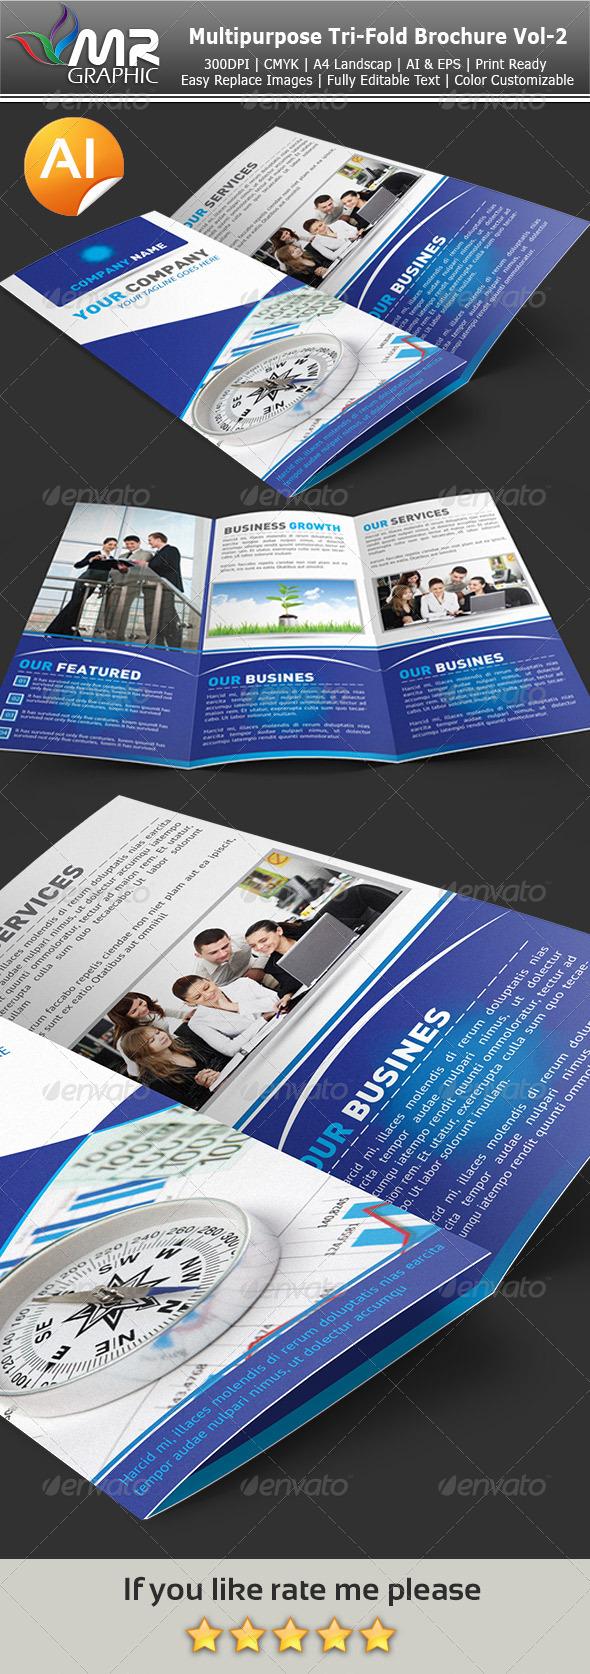 Multipurpose Tri-Fold Brochure Vol-2 - Corporate Brochures